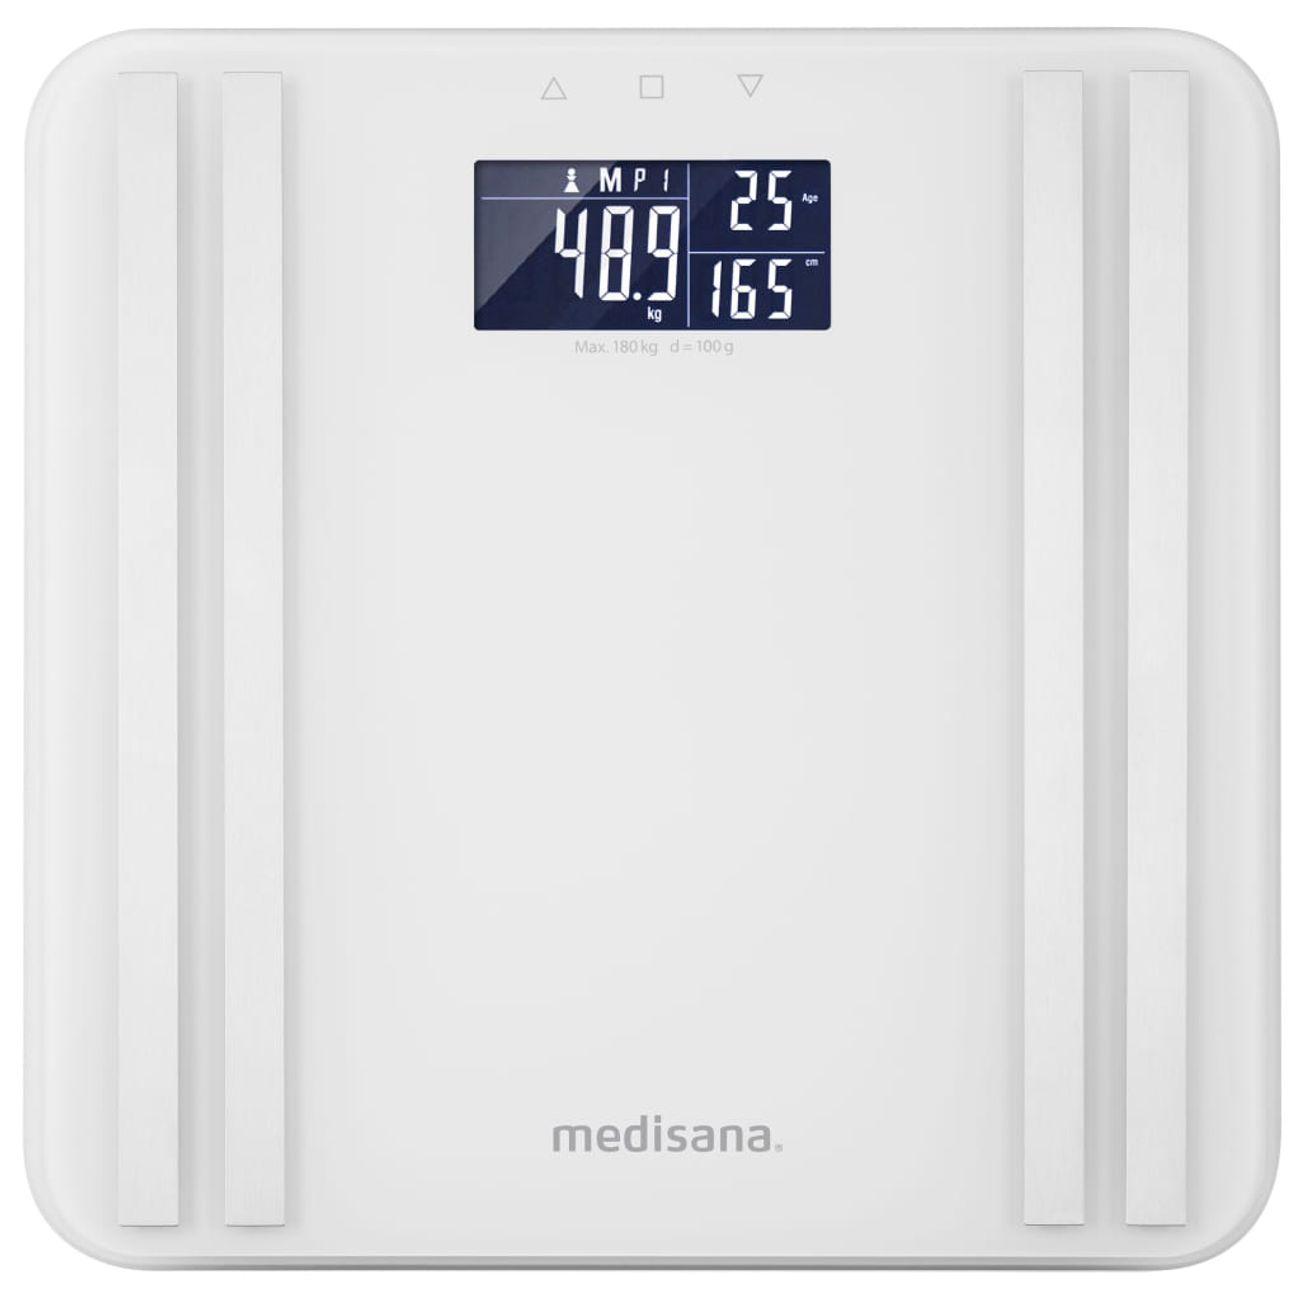 MEDISANA Medisana Pèse-personne BS 465 Blanc